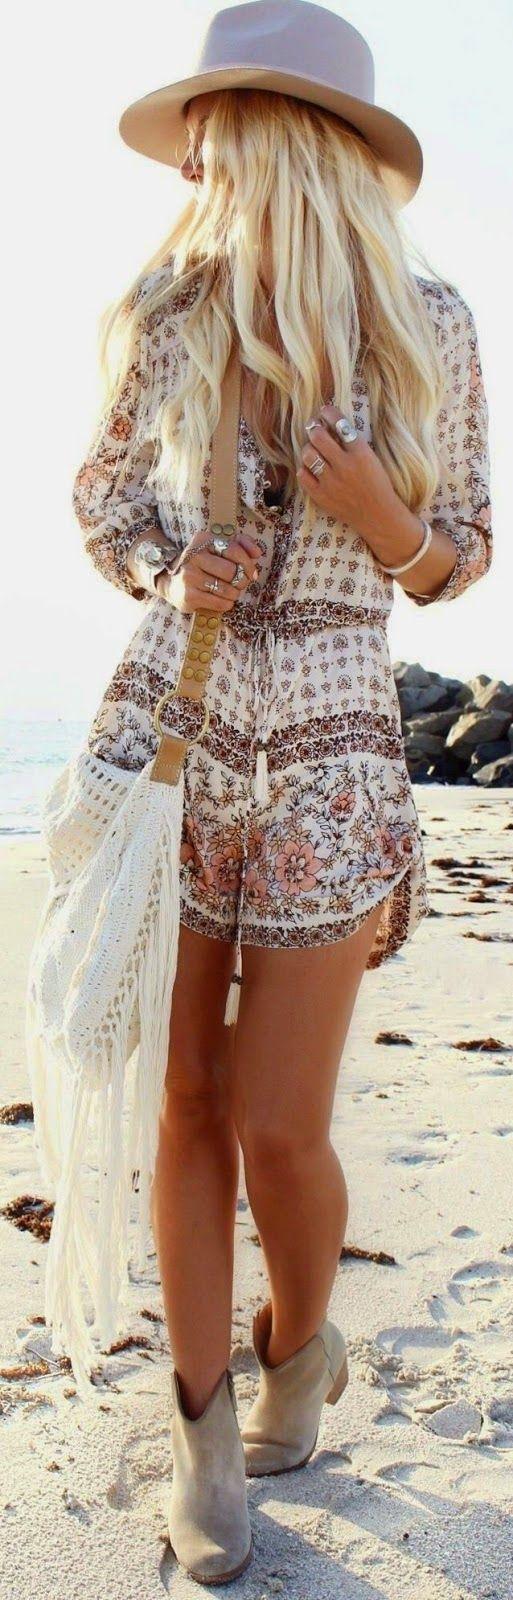 top 25+ best summer beach outfits ideas on pinterest | casual